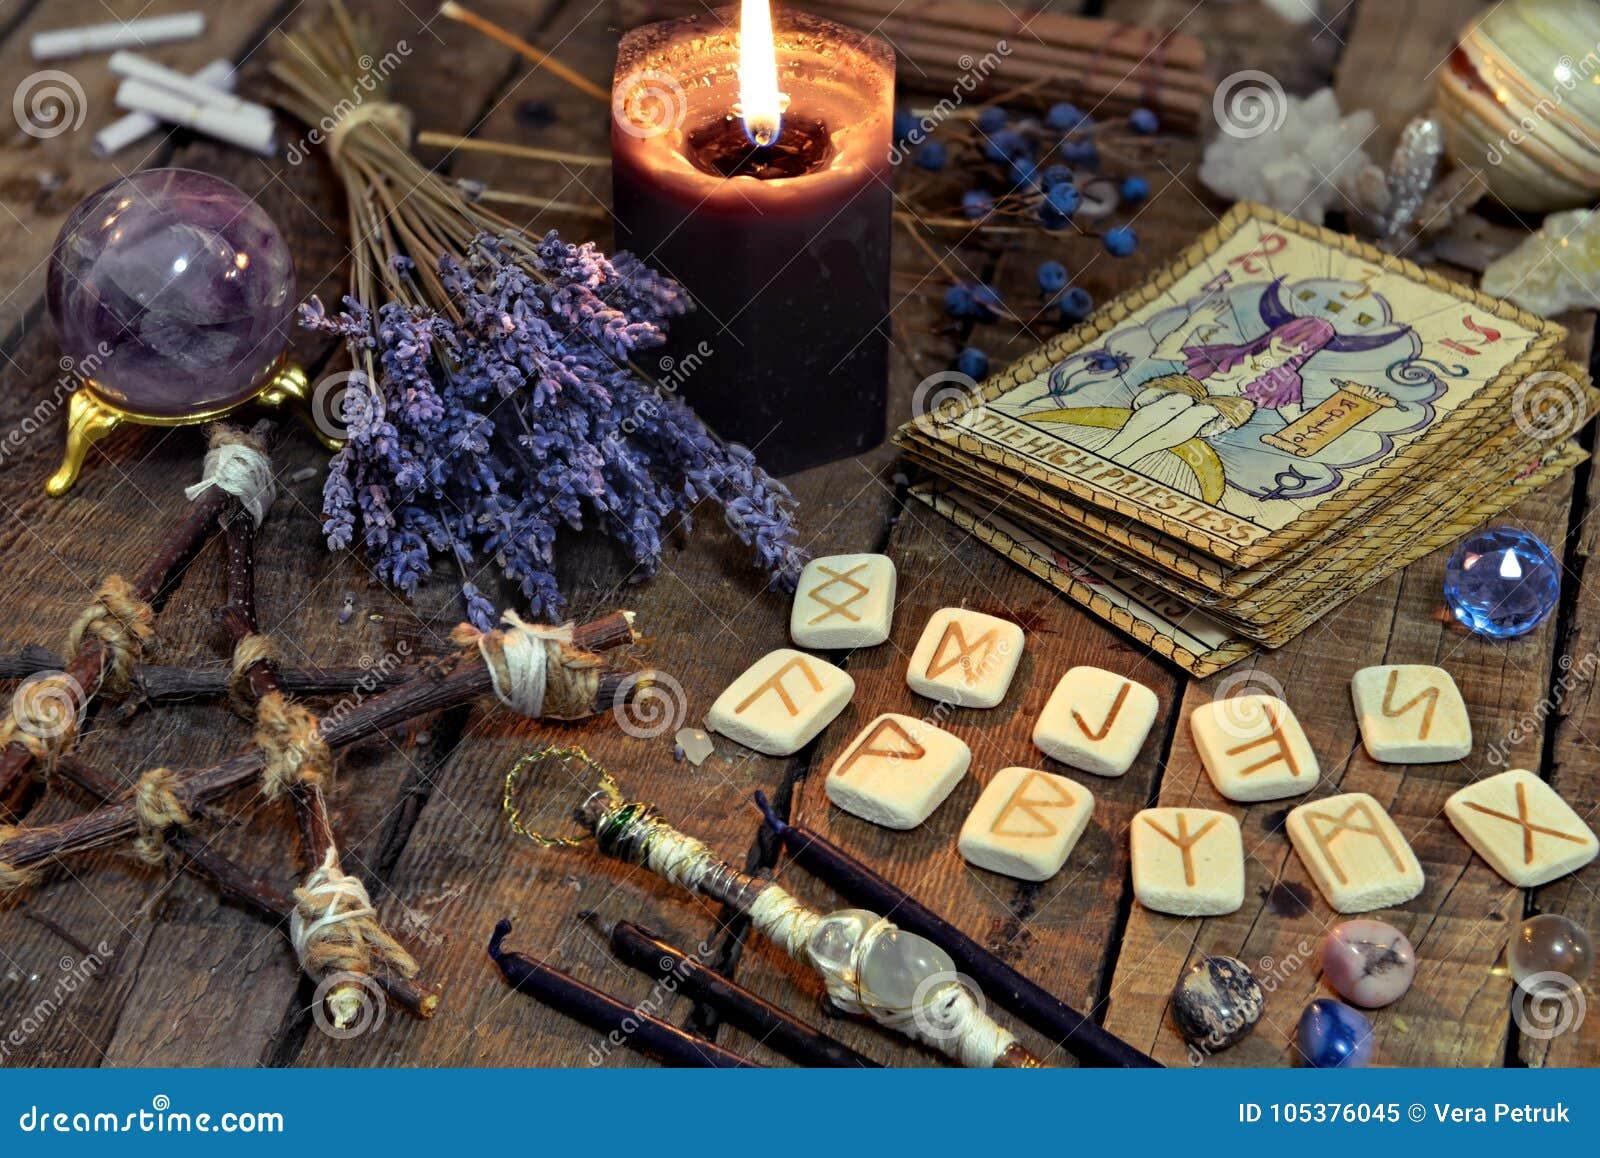 Tarockkarten, alte Runen, schwarze Kerze und Pentagram